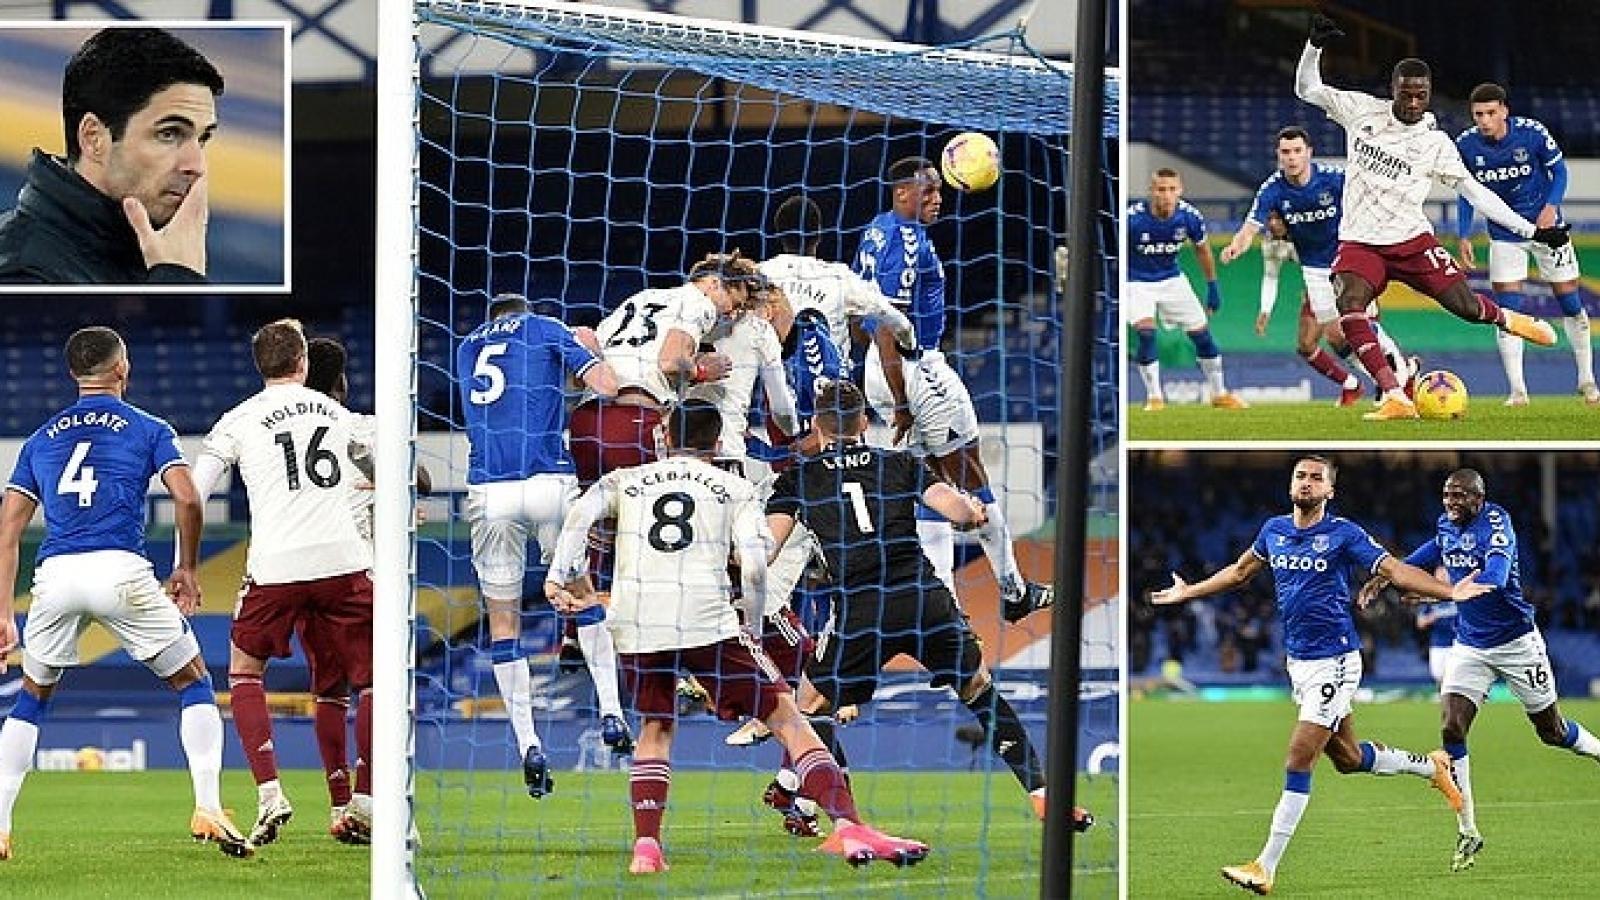 Premier League: Man City áp sát top 4, Arsenal chìm trong khủng hoảng